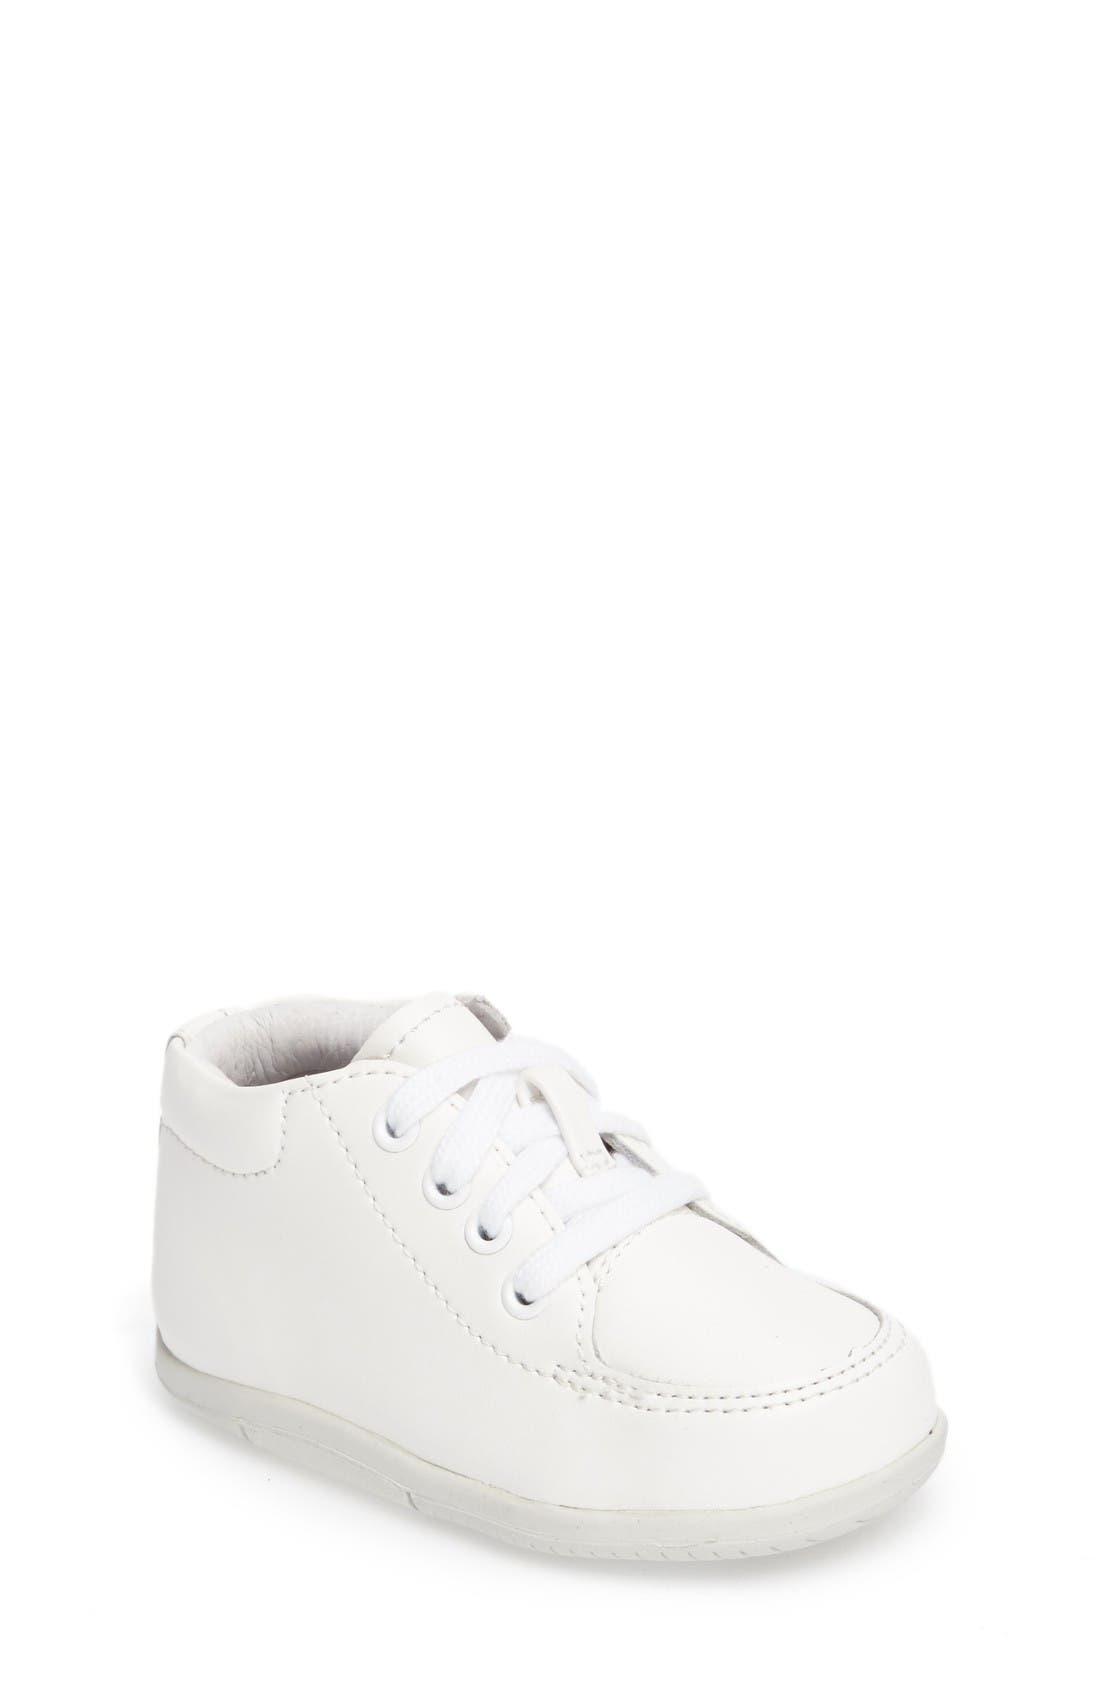 Alternate Image 1 Selected - Stride Rite Grayson Sneaker (Baby, Walker & Toddler)